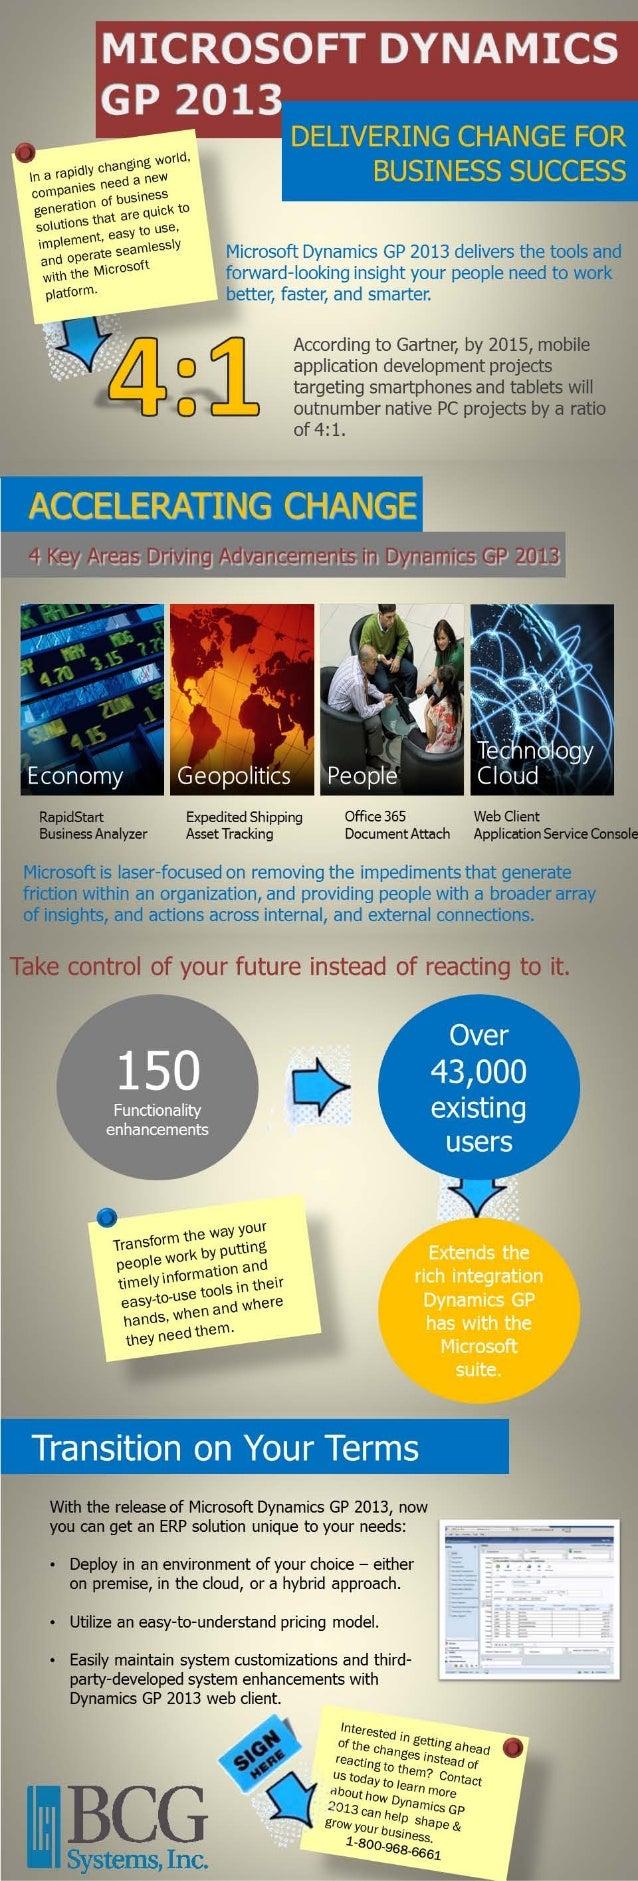 Microsoft Dynamics GP 2013 - Delivering Change for Business Success